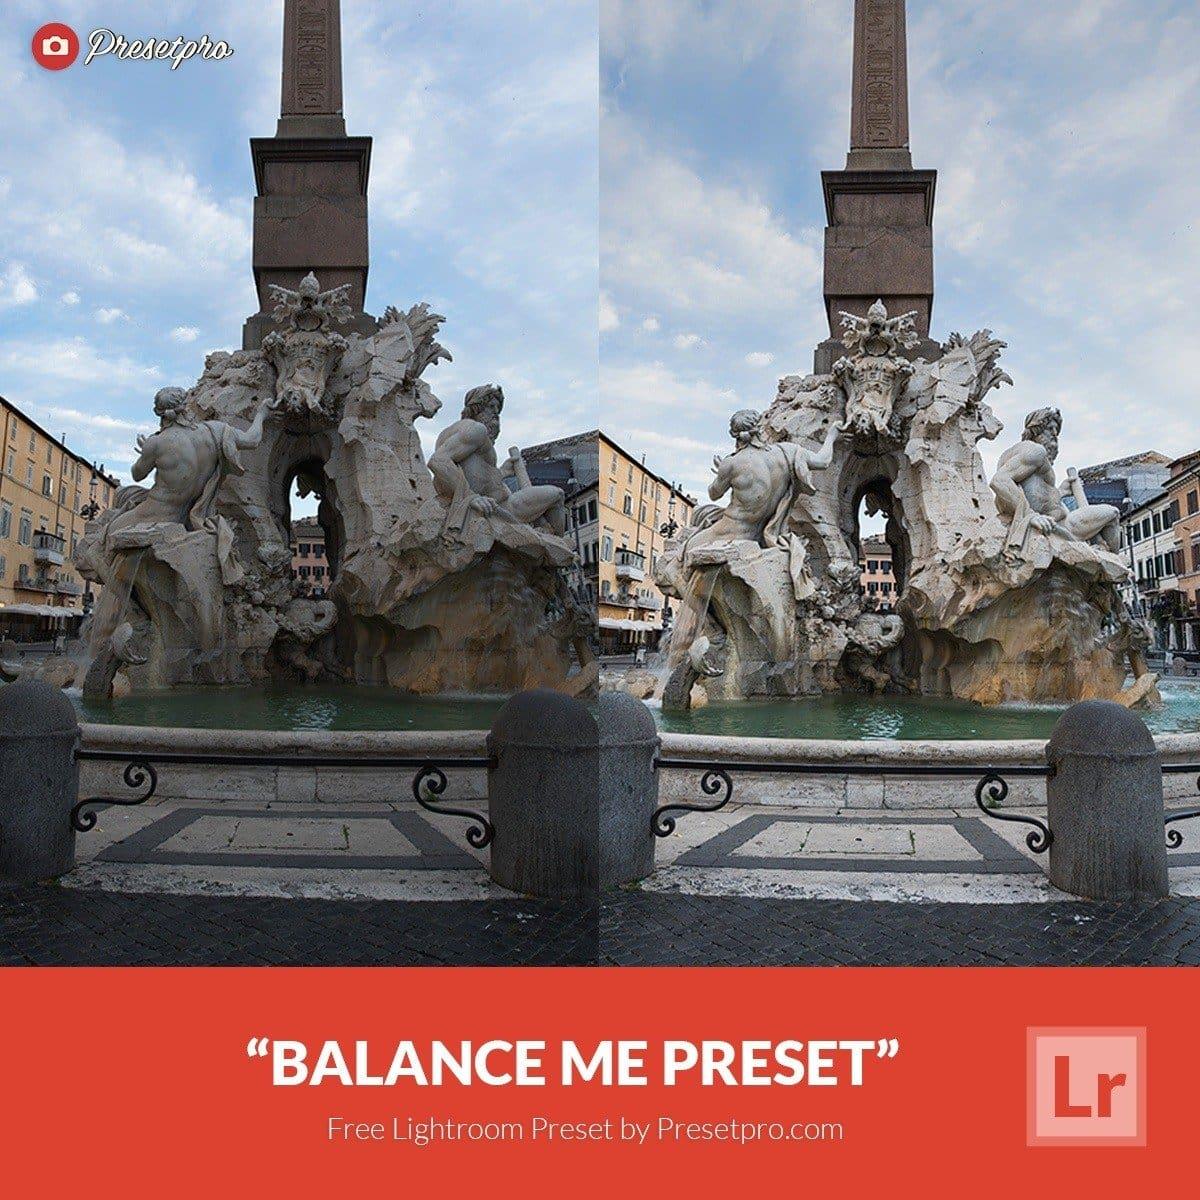 Free-Lightroom-Preset-Balance-Me